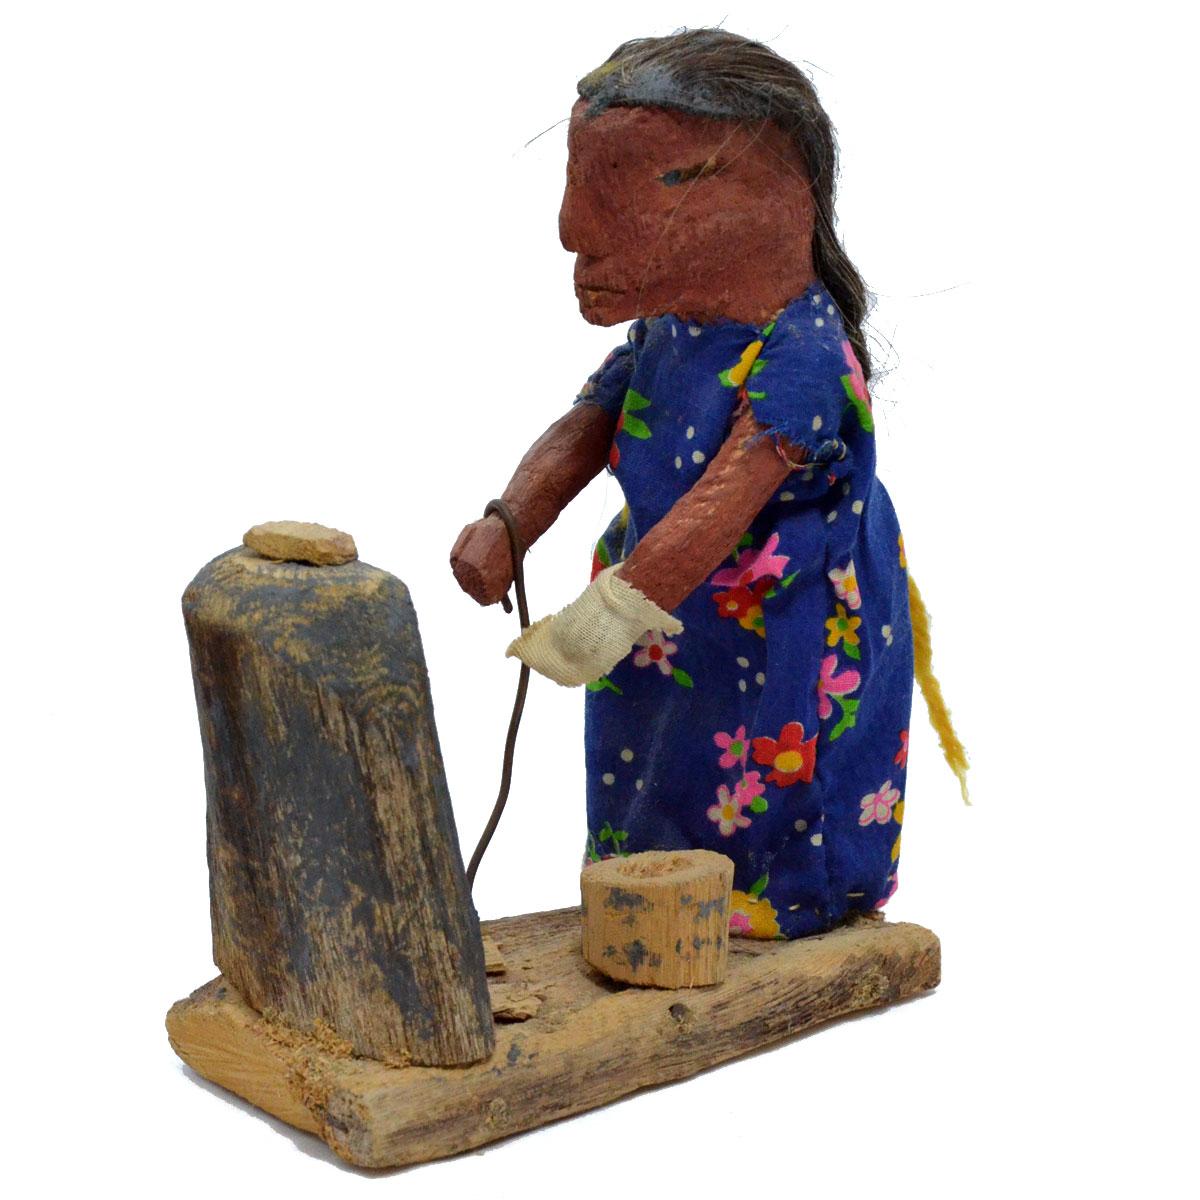 Native American Basketry by Chepa Franco